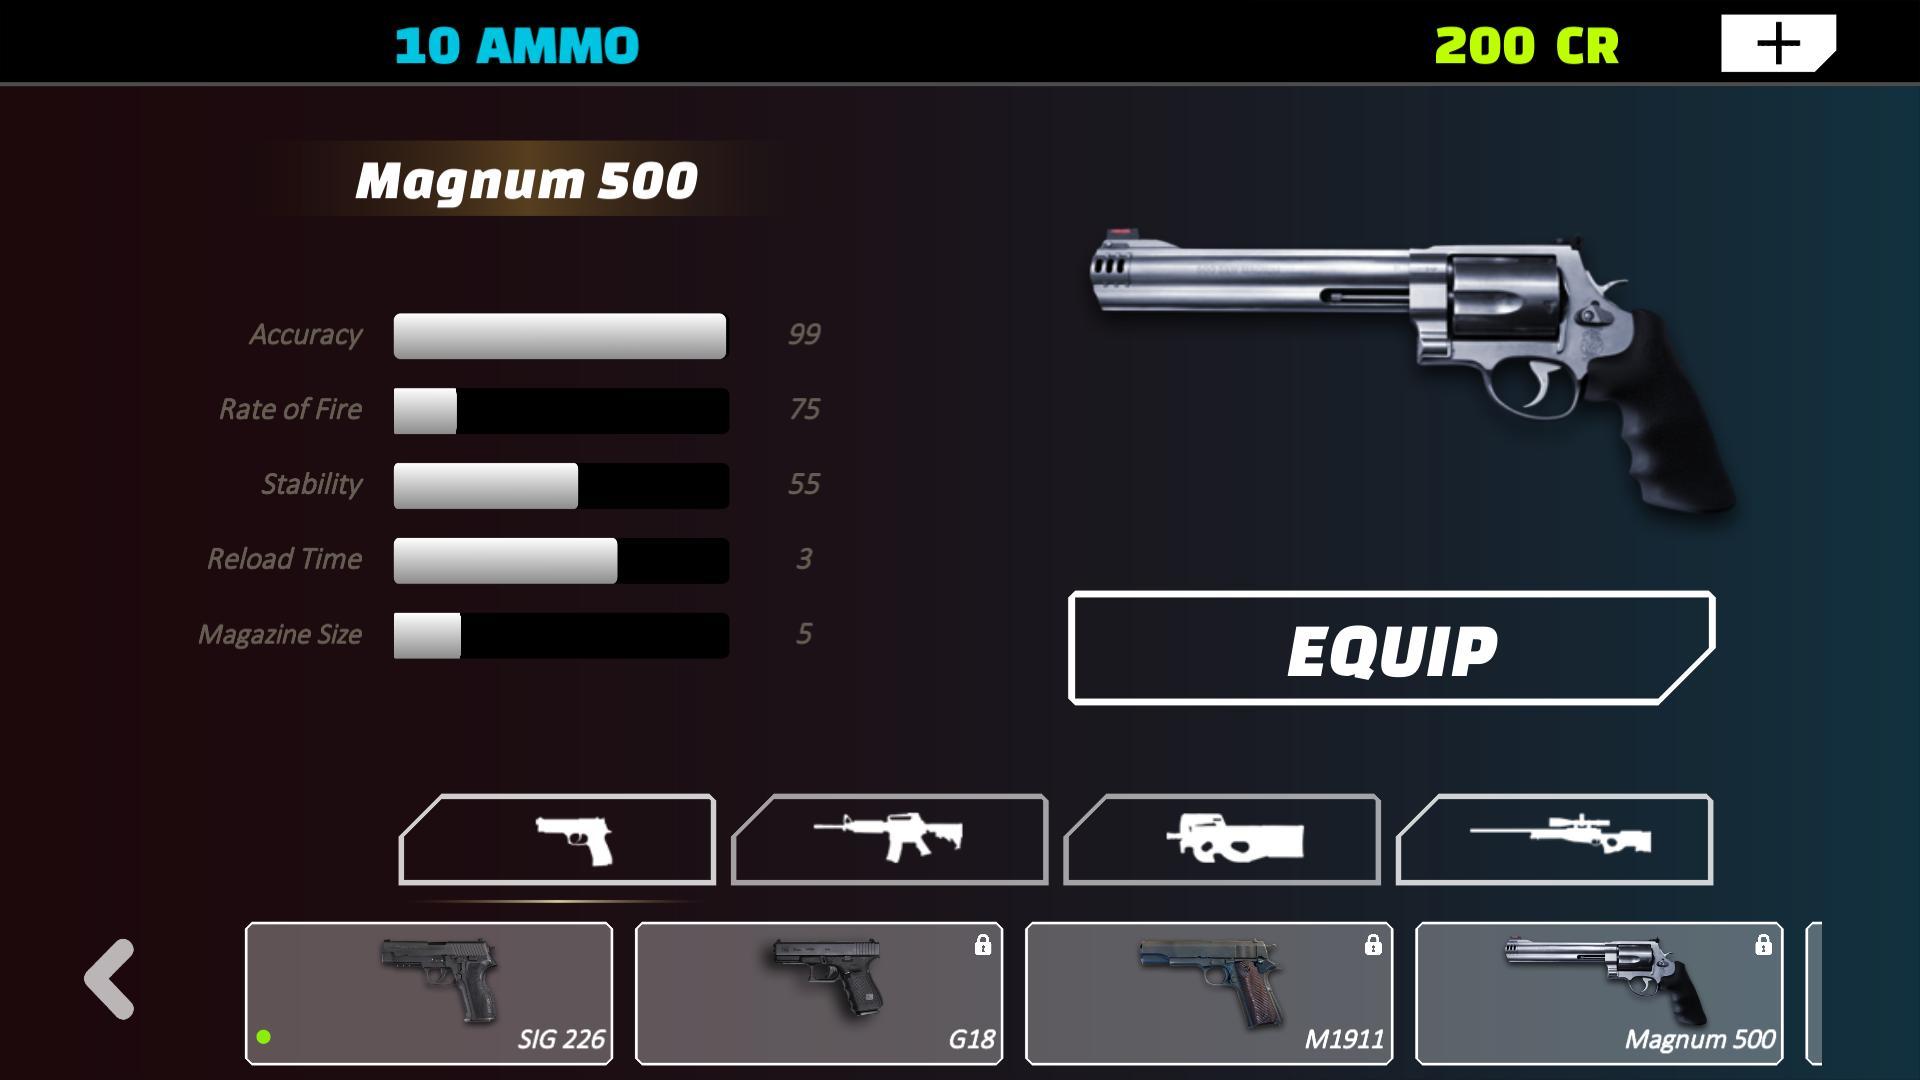 Canyon Shooting 2 - Free Shooting Range 3.0.6 Screenshot 5